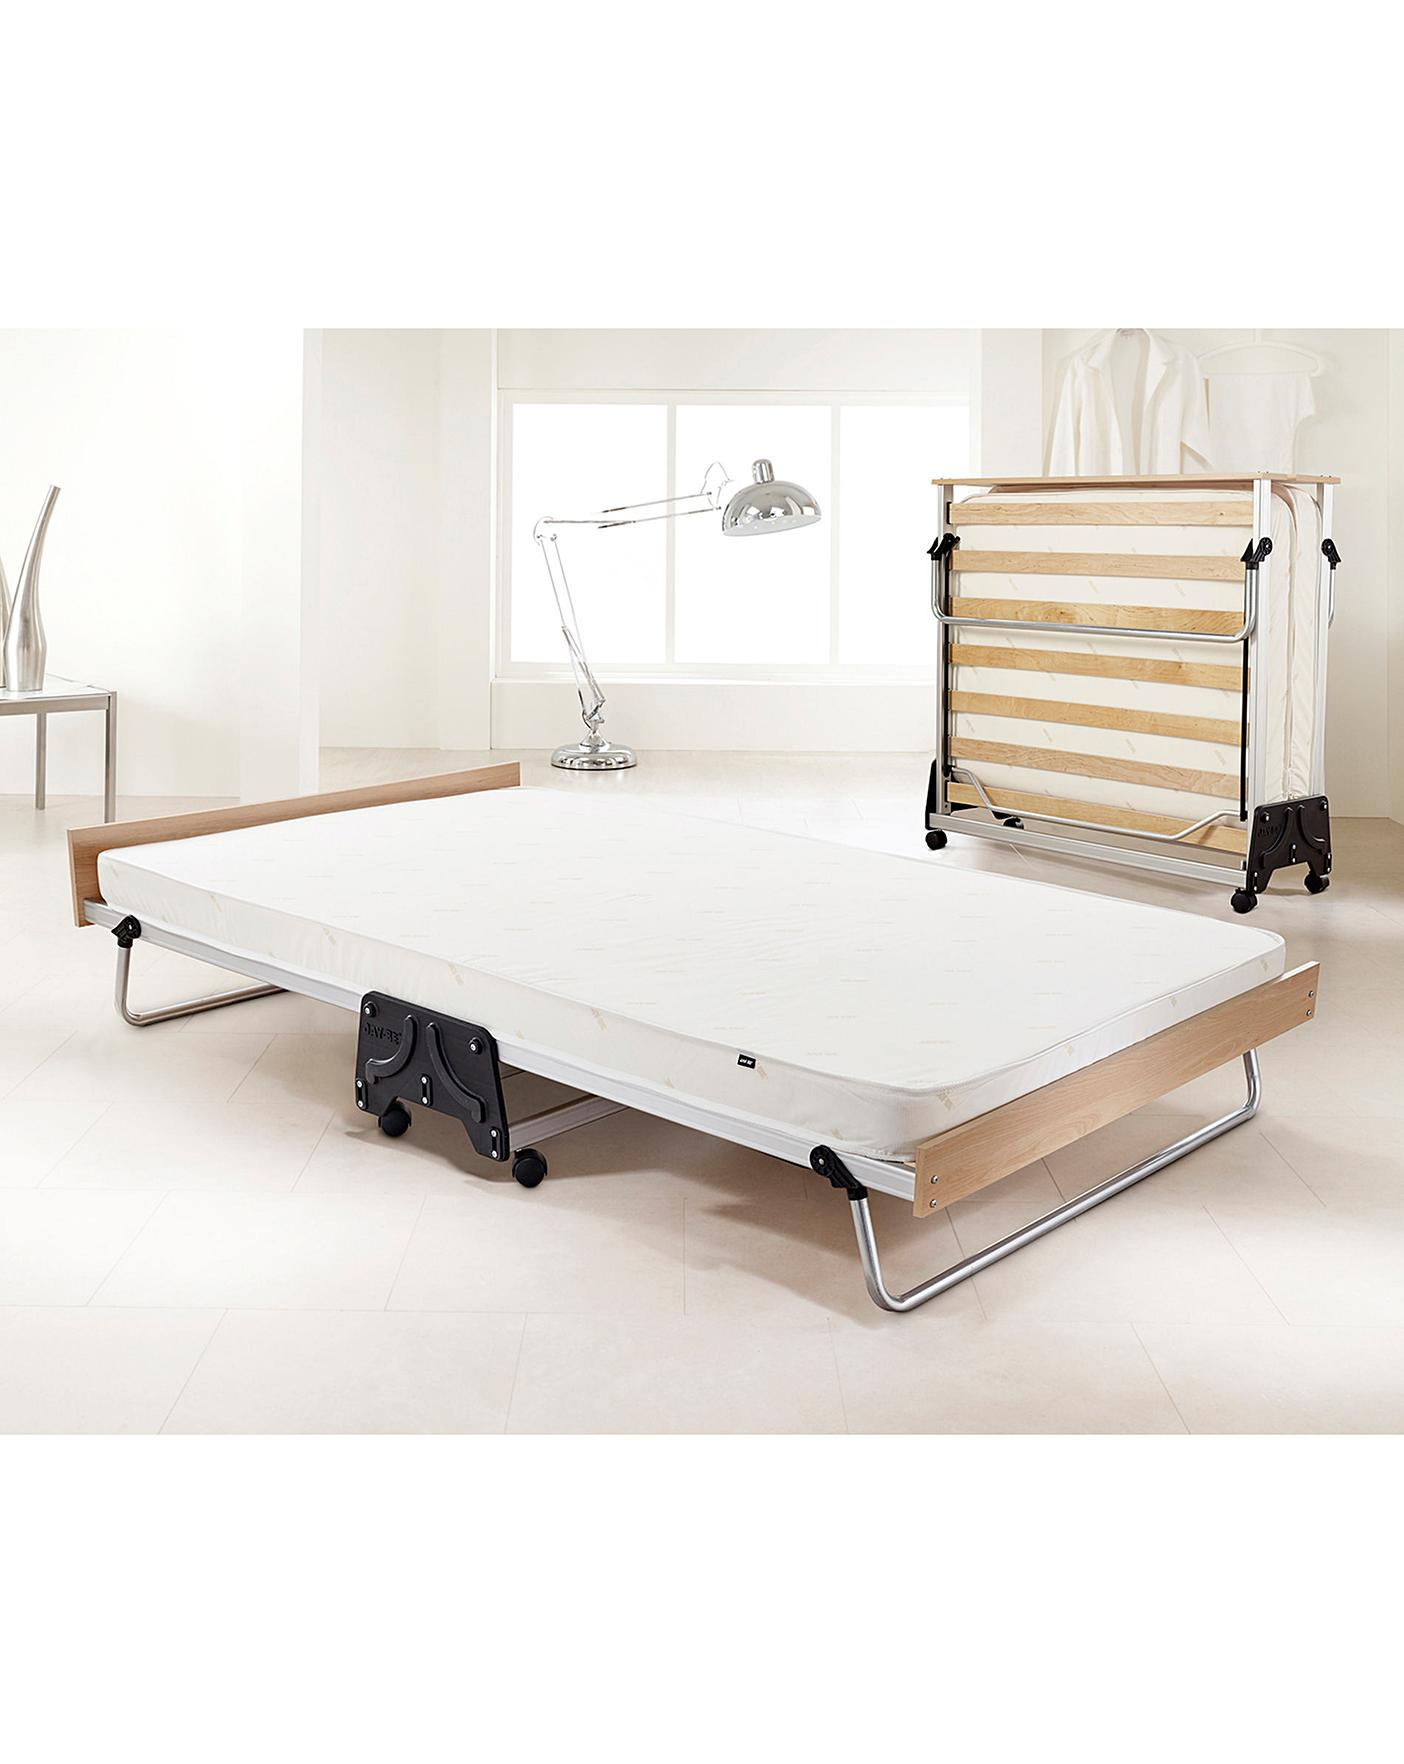 Picture of: J Bed Double Fold Bed E Fibre Mattress J D Williams